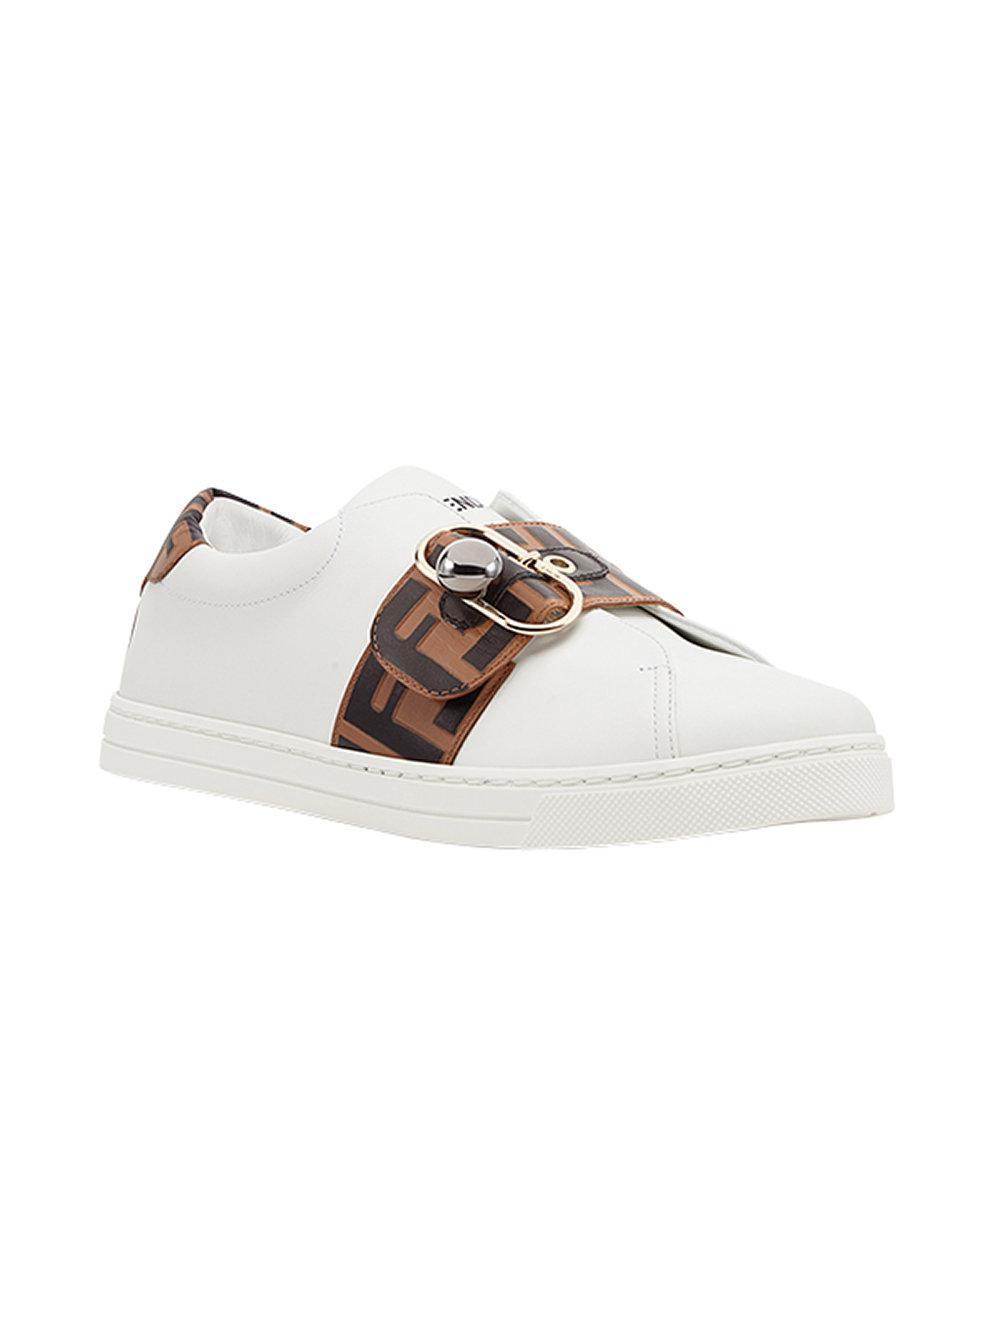 Fendi Fur Ff Band Sneakers in White